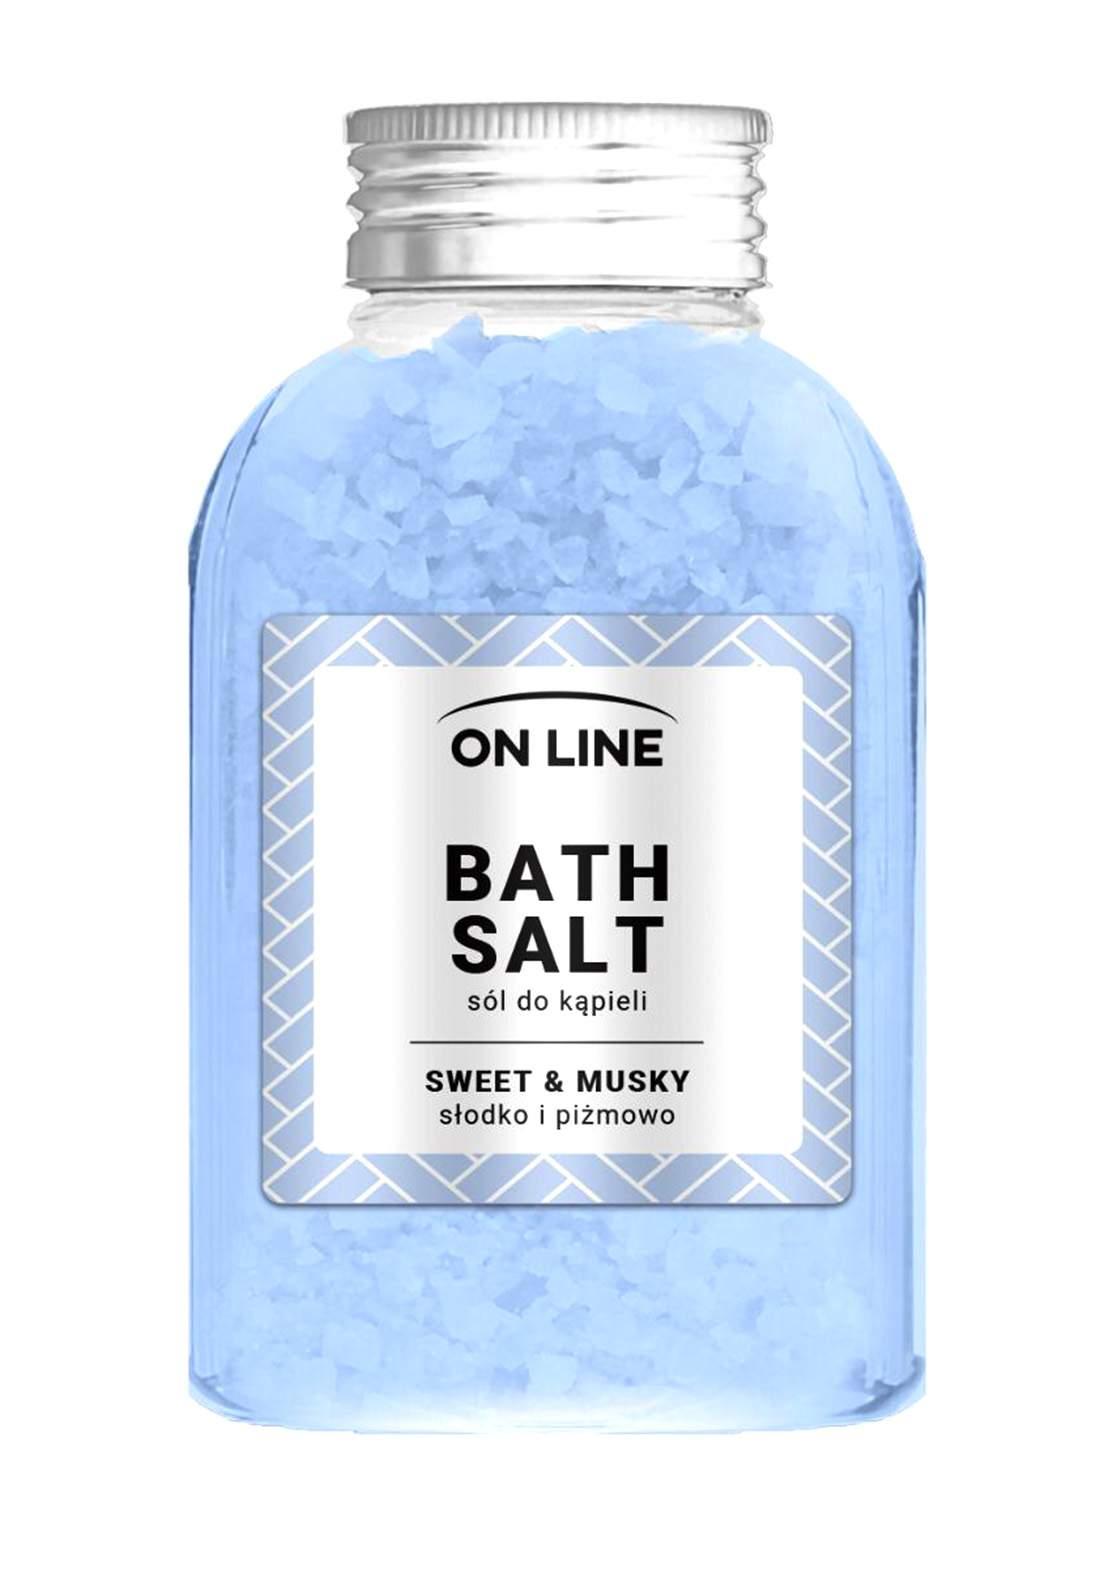 Online Sweet&musky bath salts 600g املاح العناية بالجسم